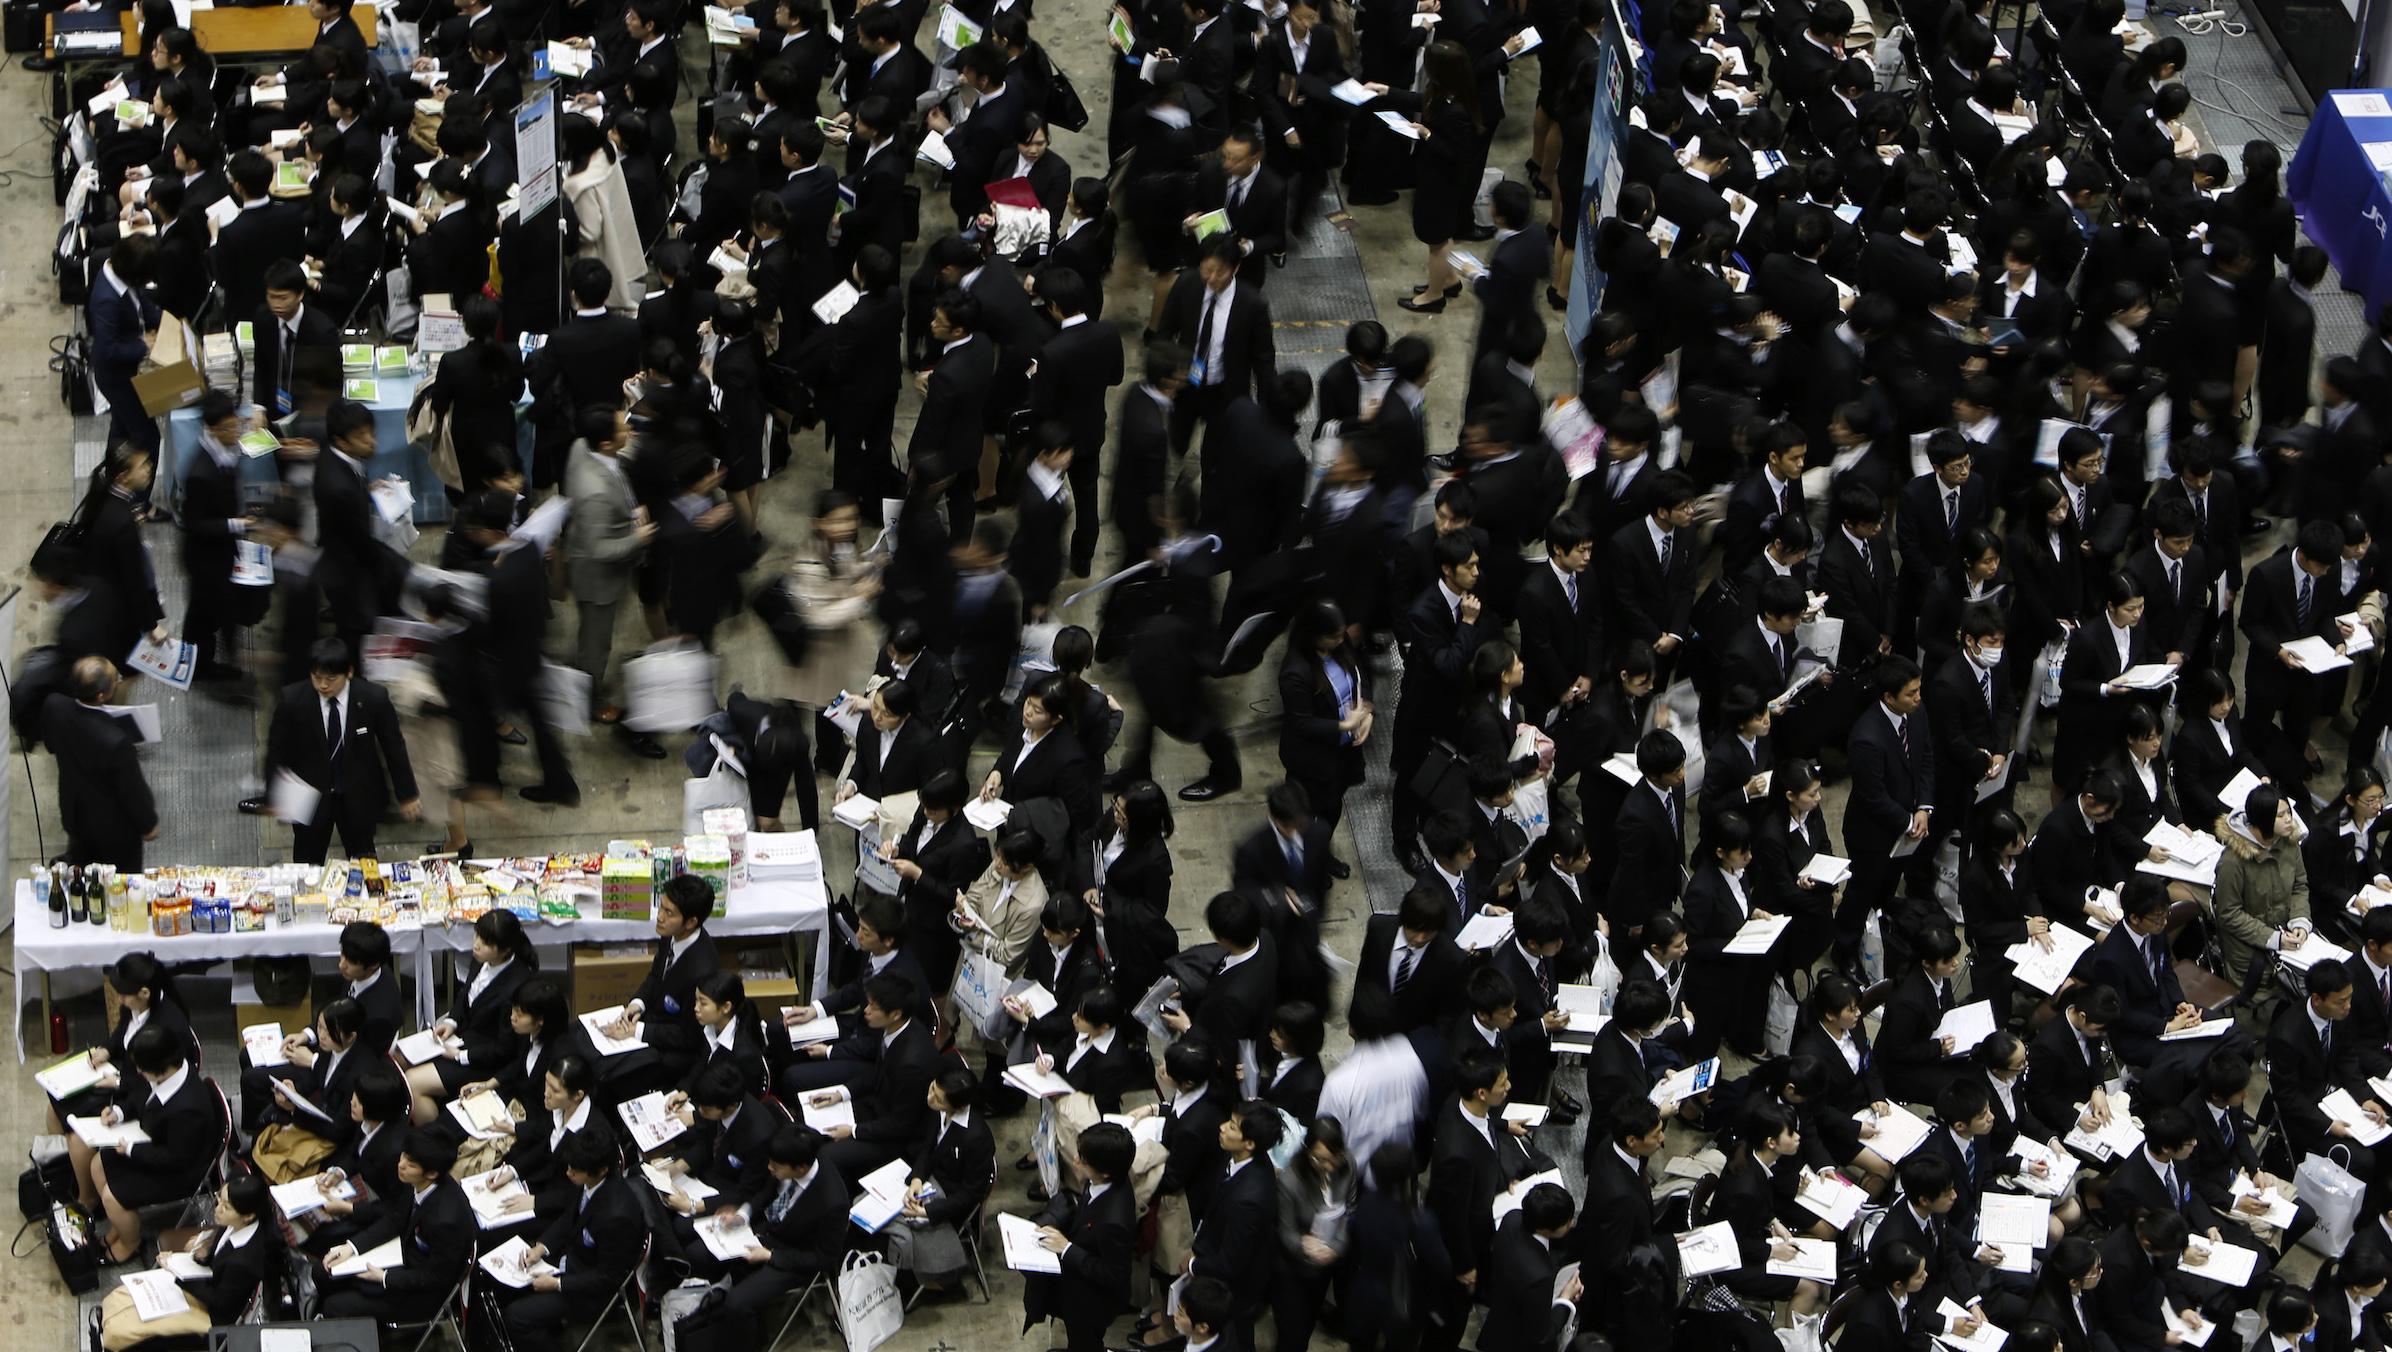 Job seekers attend a job fair held for fresh graduates in Tokyo